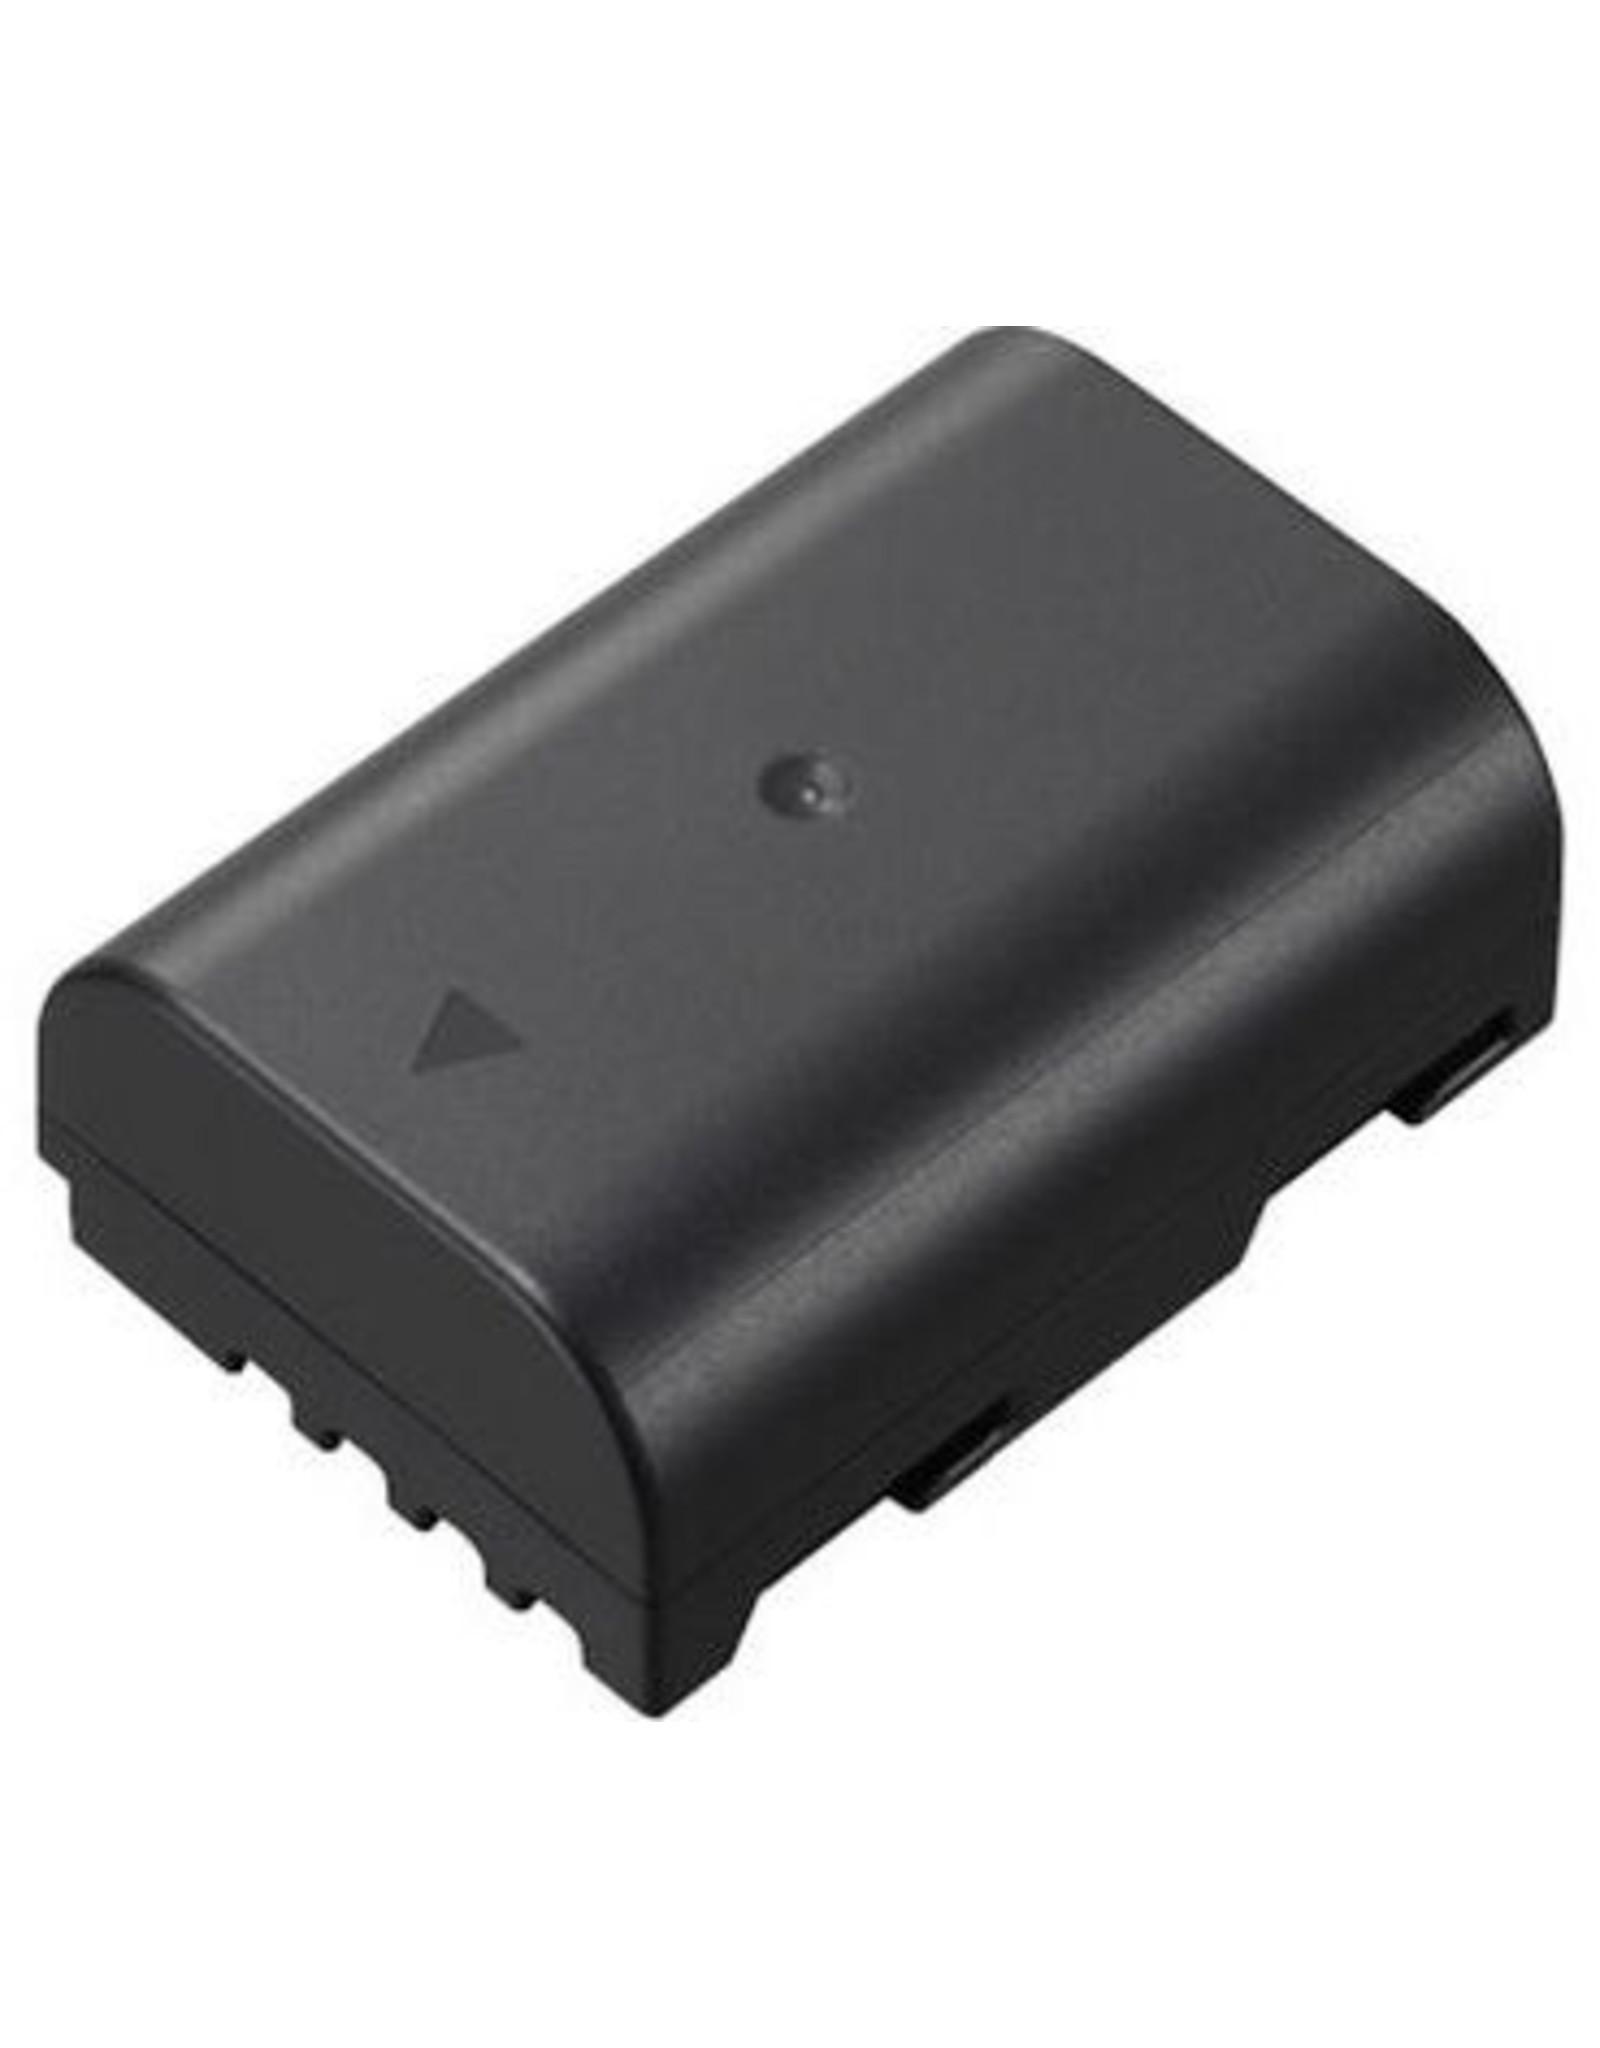 Panasonic Panasonic DMW-BLF19 Battery for Lumix GH3,GH4 and GH5 models